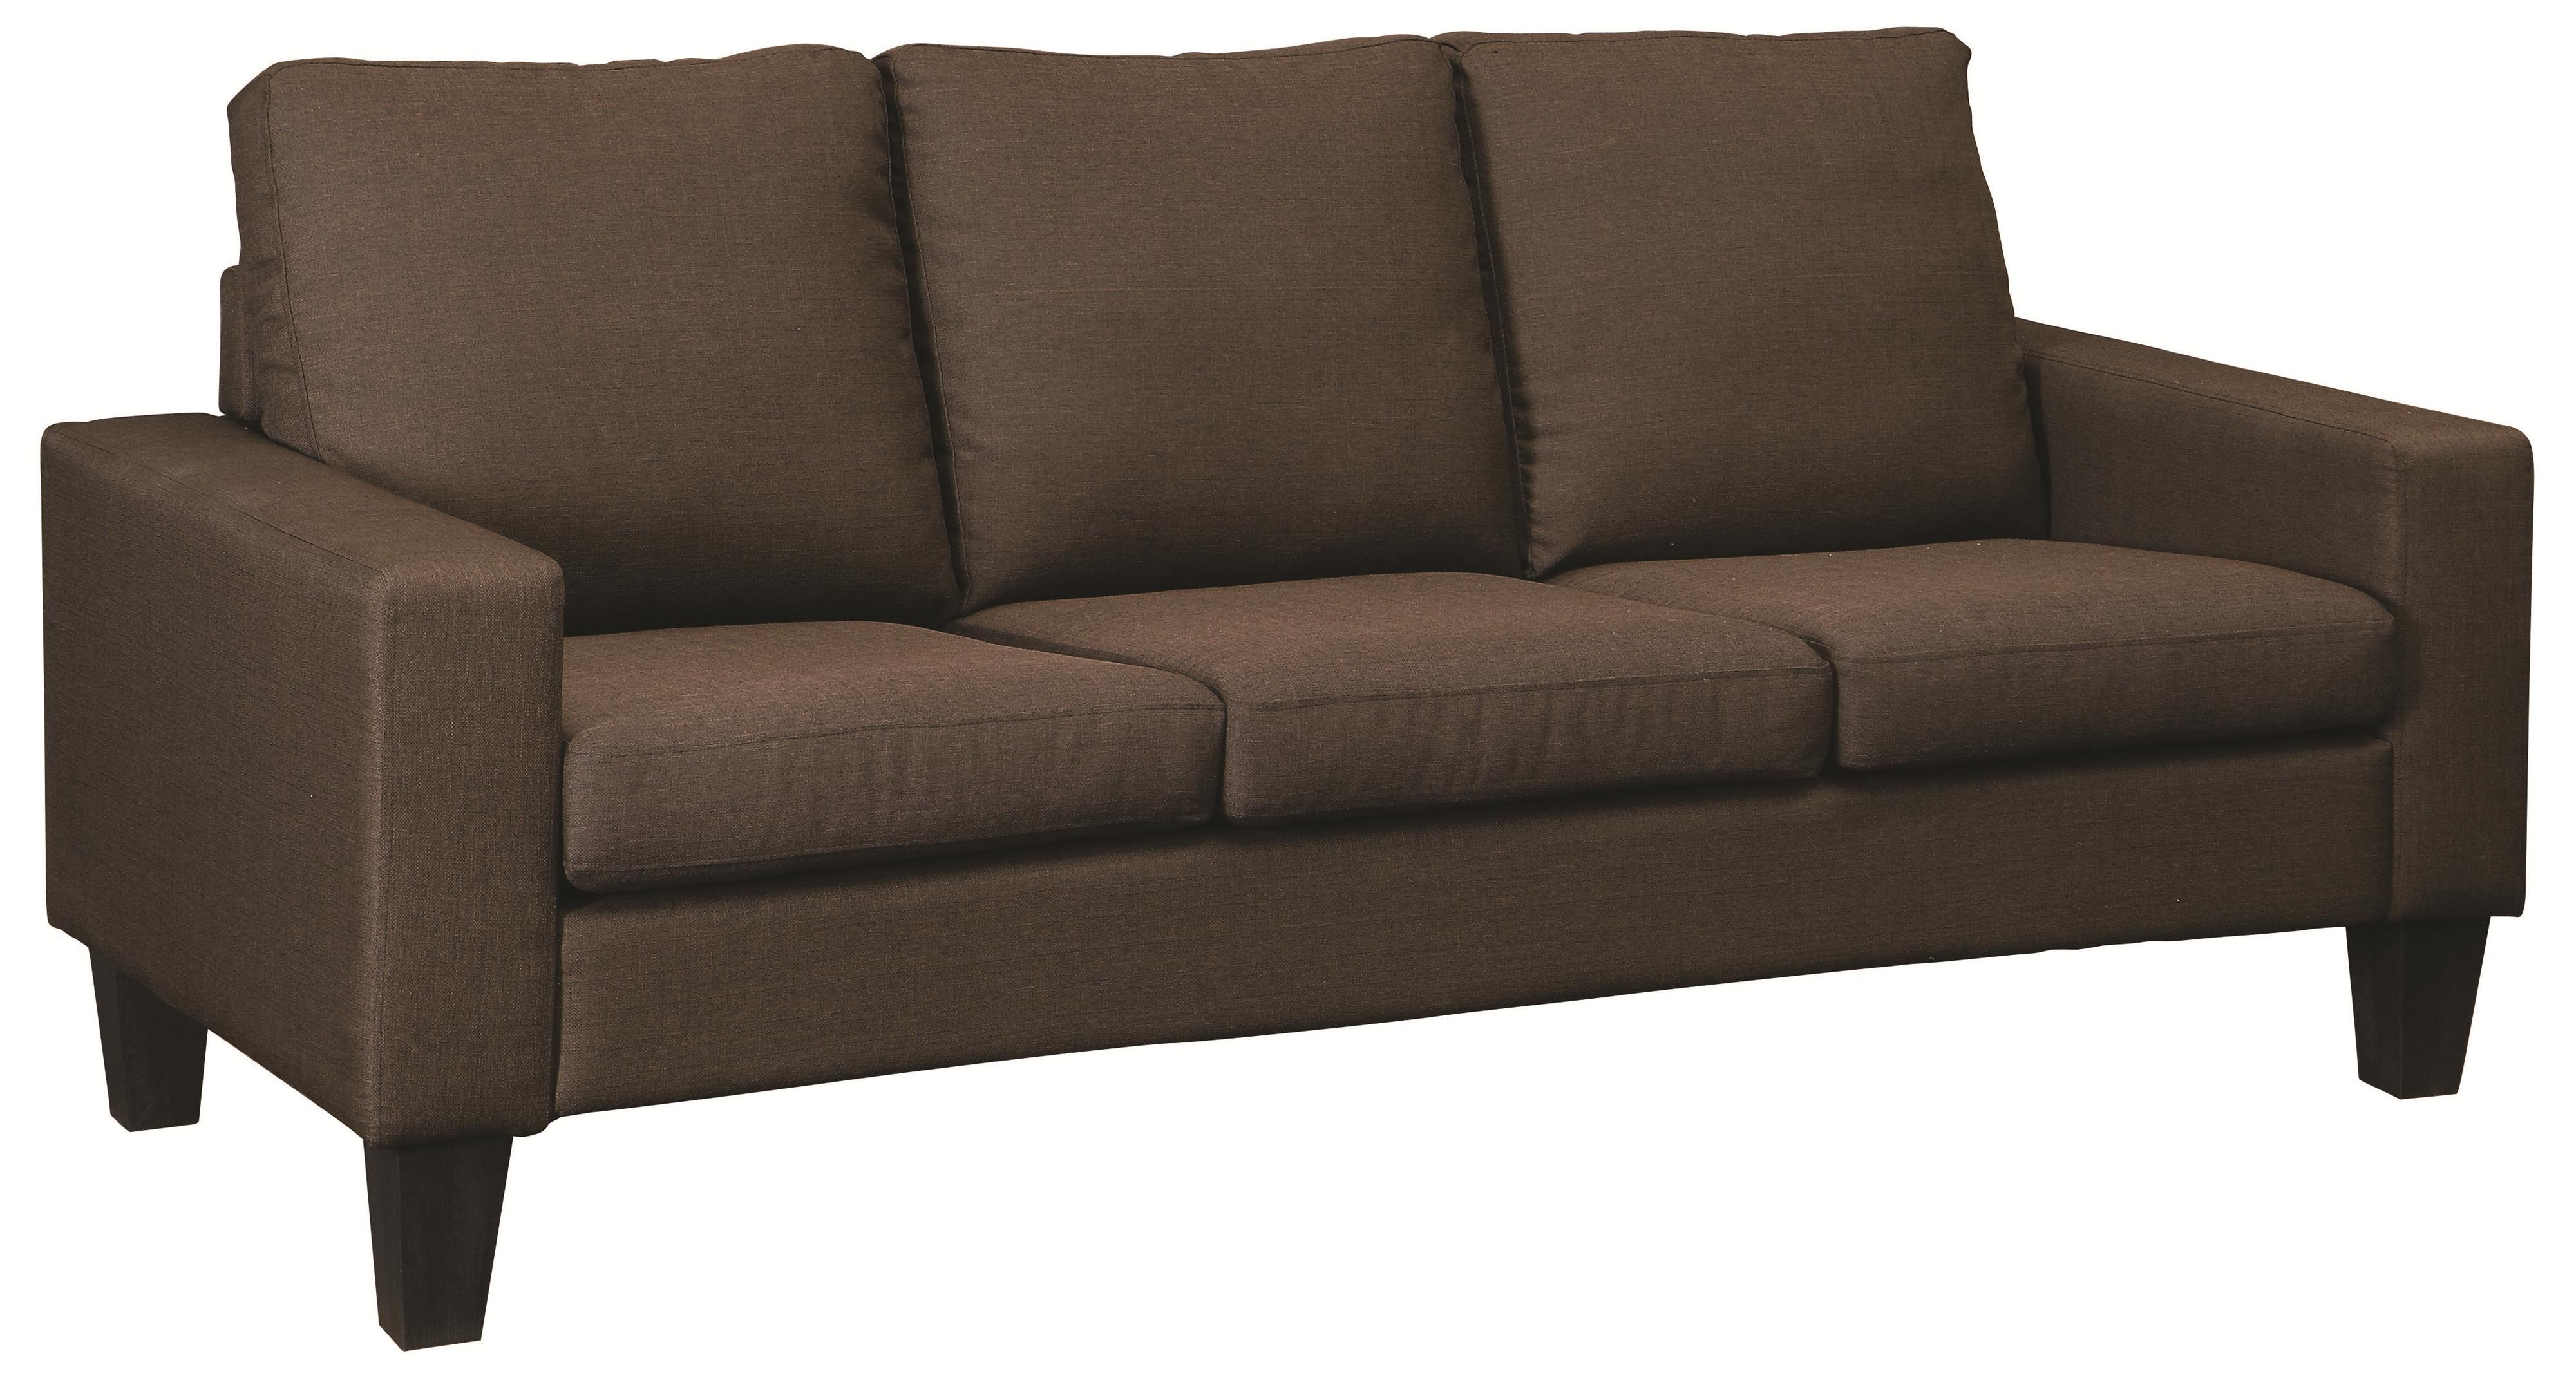 Coaster Bachman Stationary Sofa - Item Number: 504767-Chocolate Linen